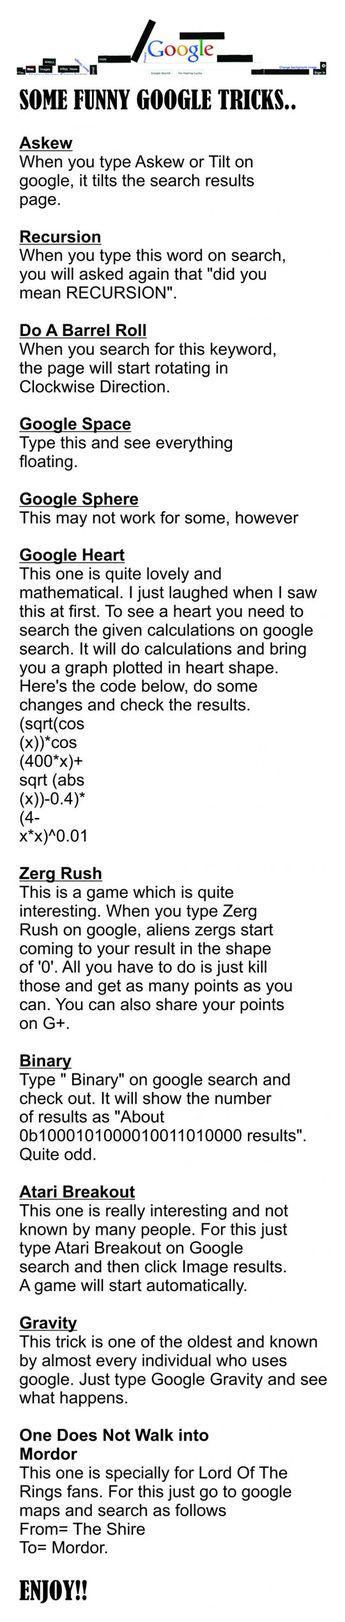 Google tricks!